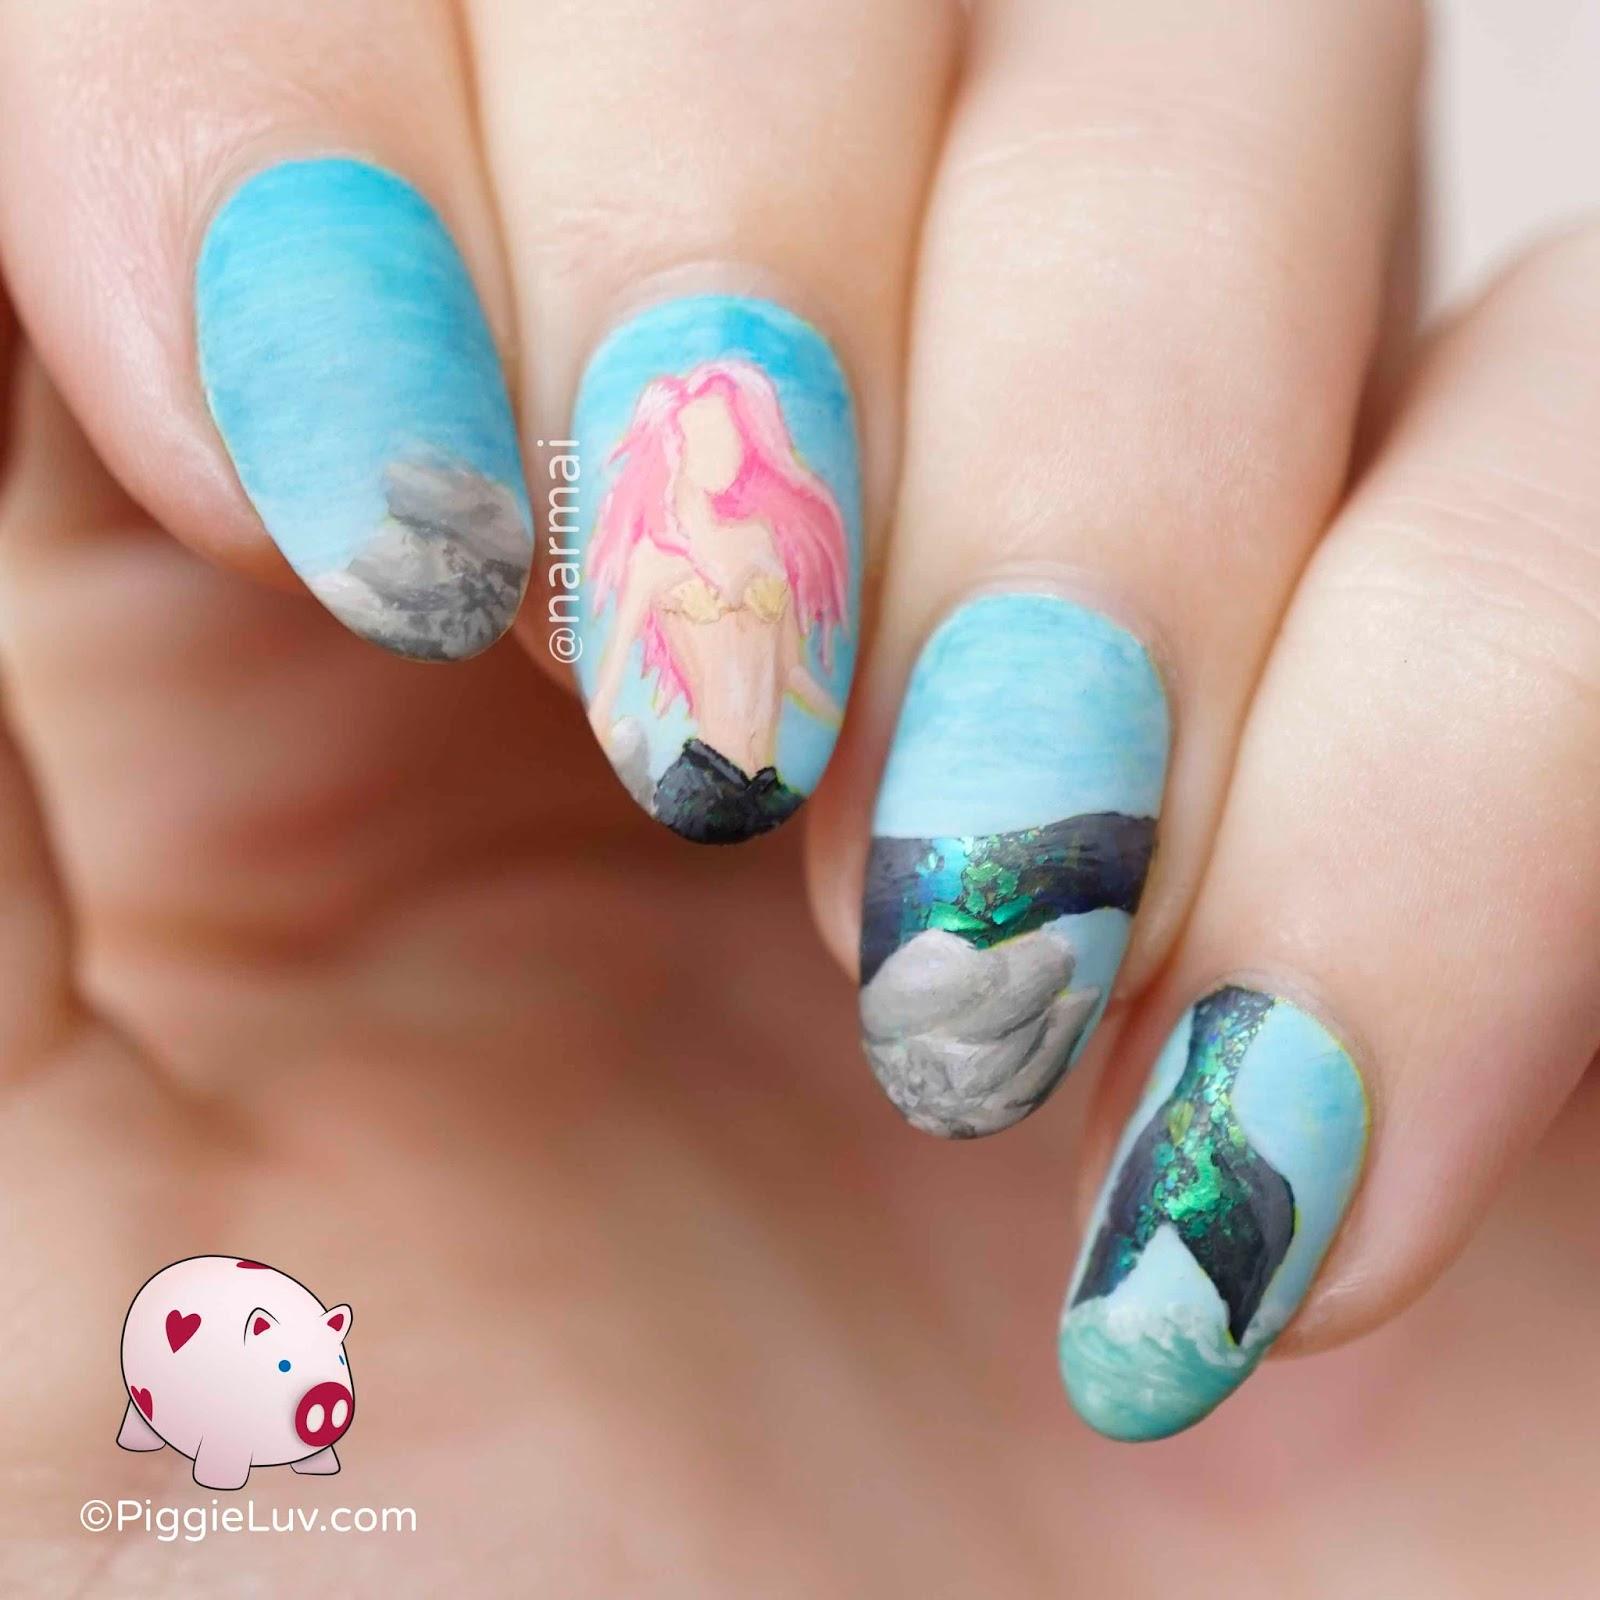 PiggieLuv: Pink haired mermaid nail art